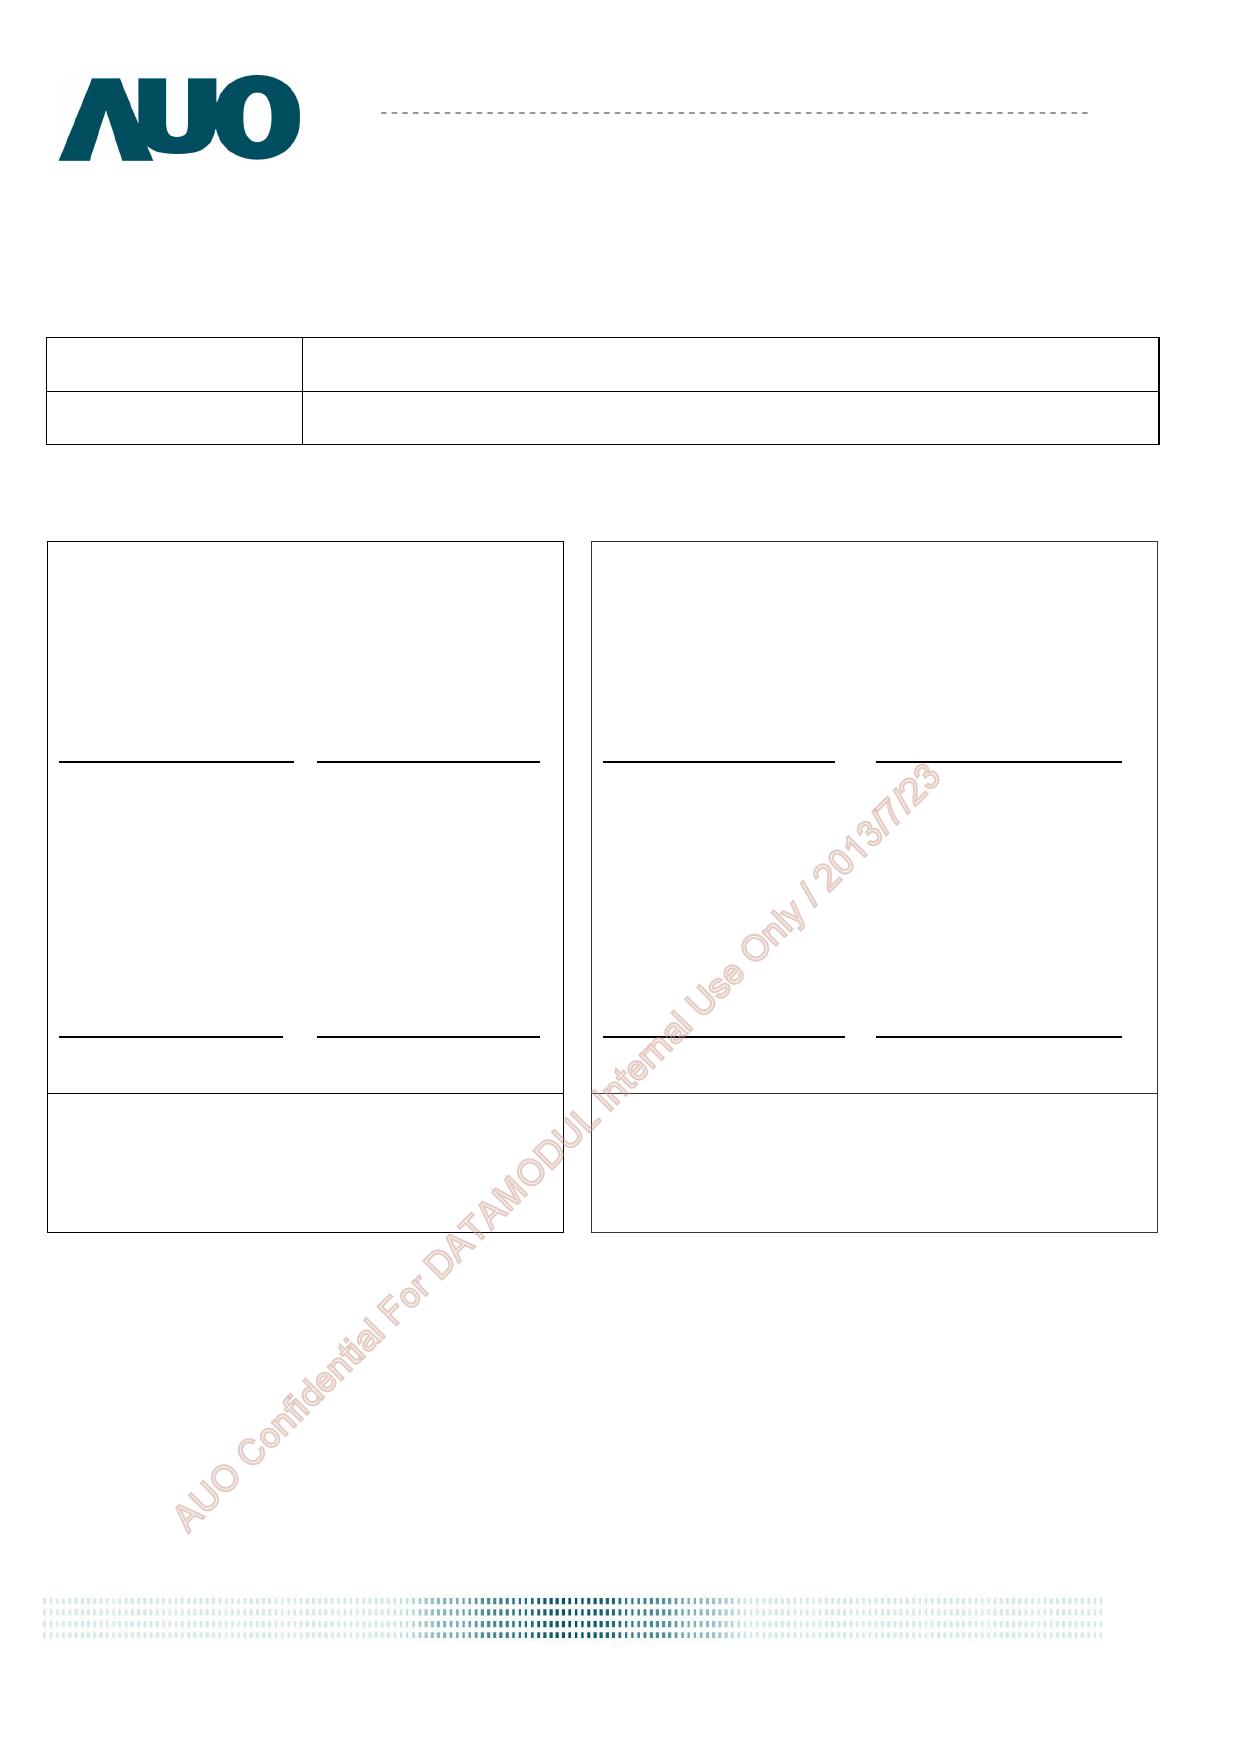 G043FW01.0 Hoja de datos, Descripción, Manual